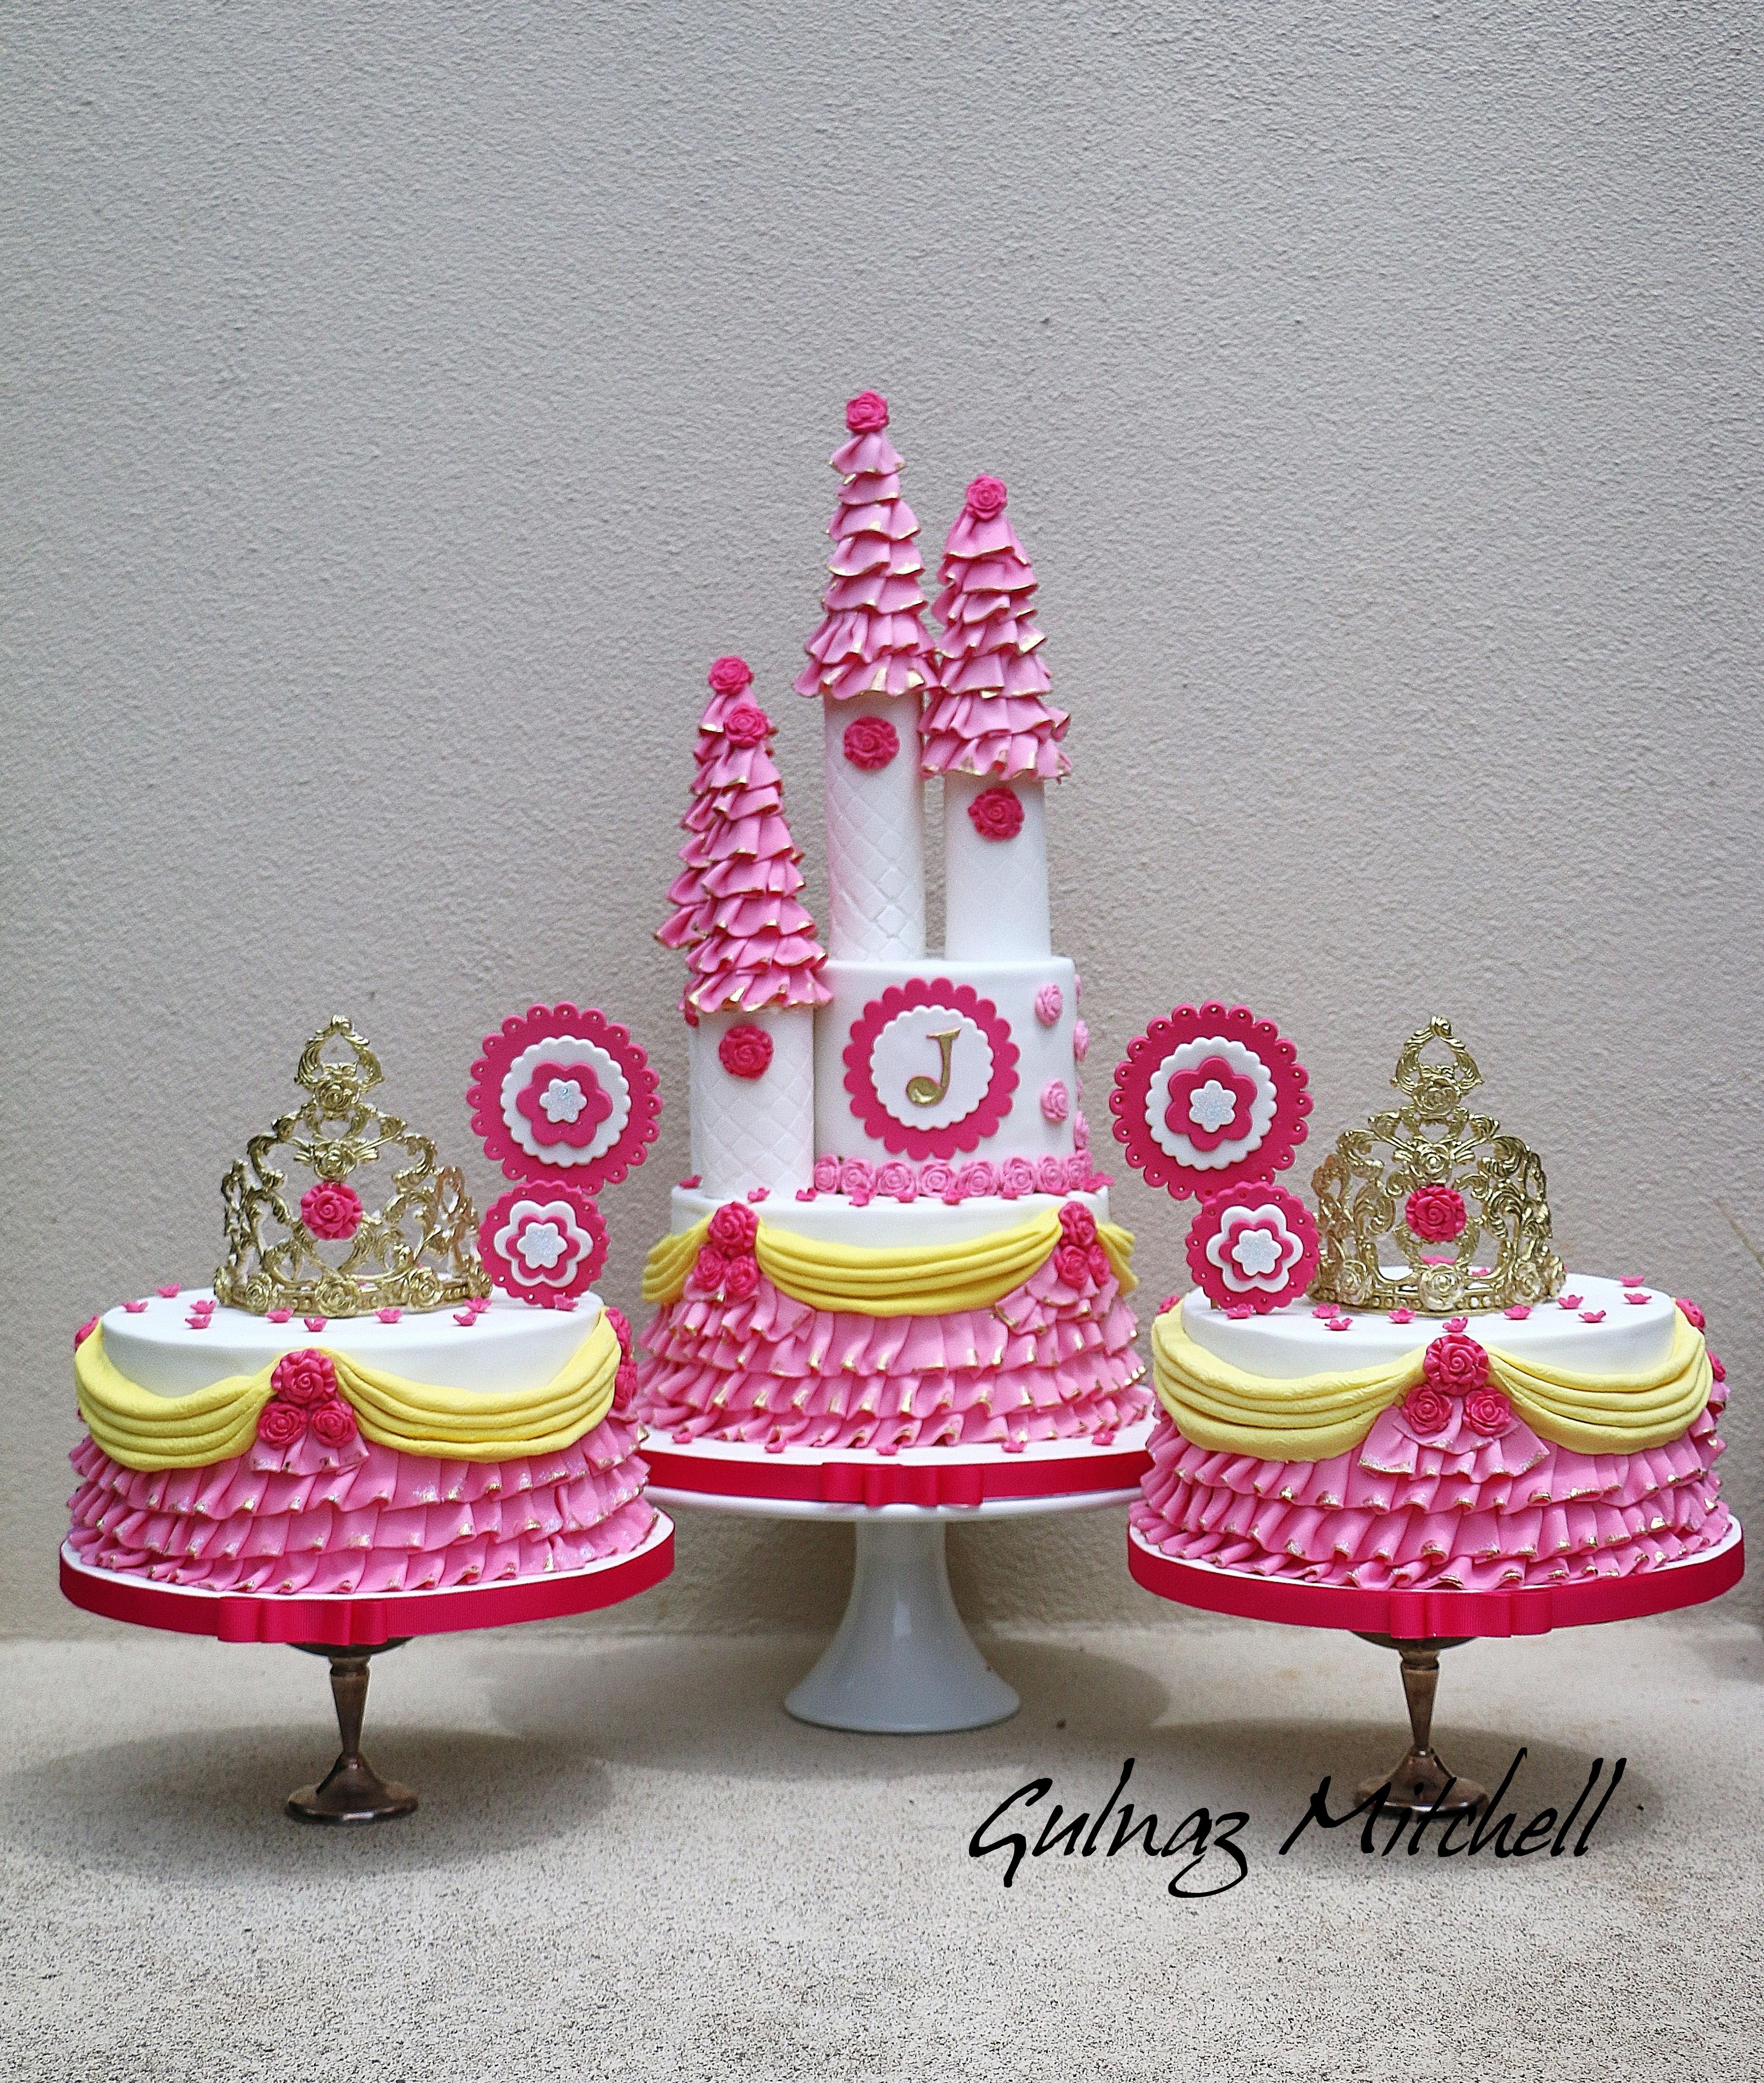 Gulnaz-Mitchell-Heavenlycakes4you-by-Gulnaz-Michell-Birthday-Baby-6-1.jpg#asset:15654